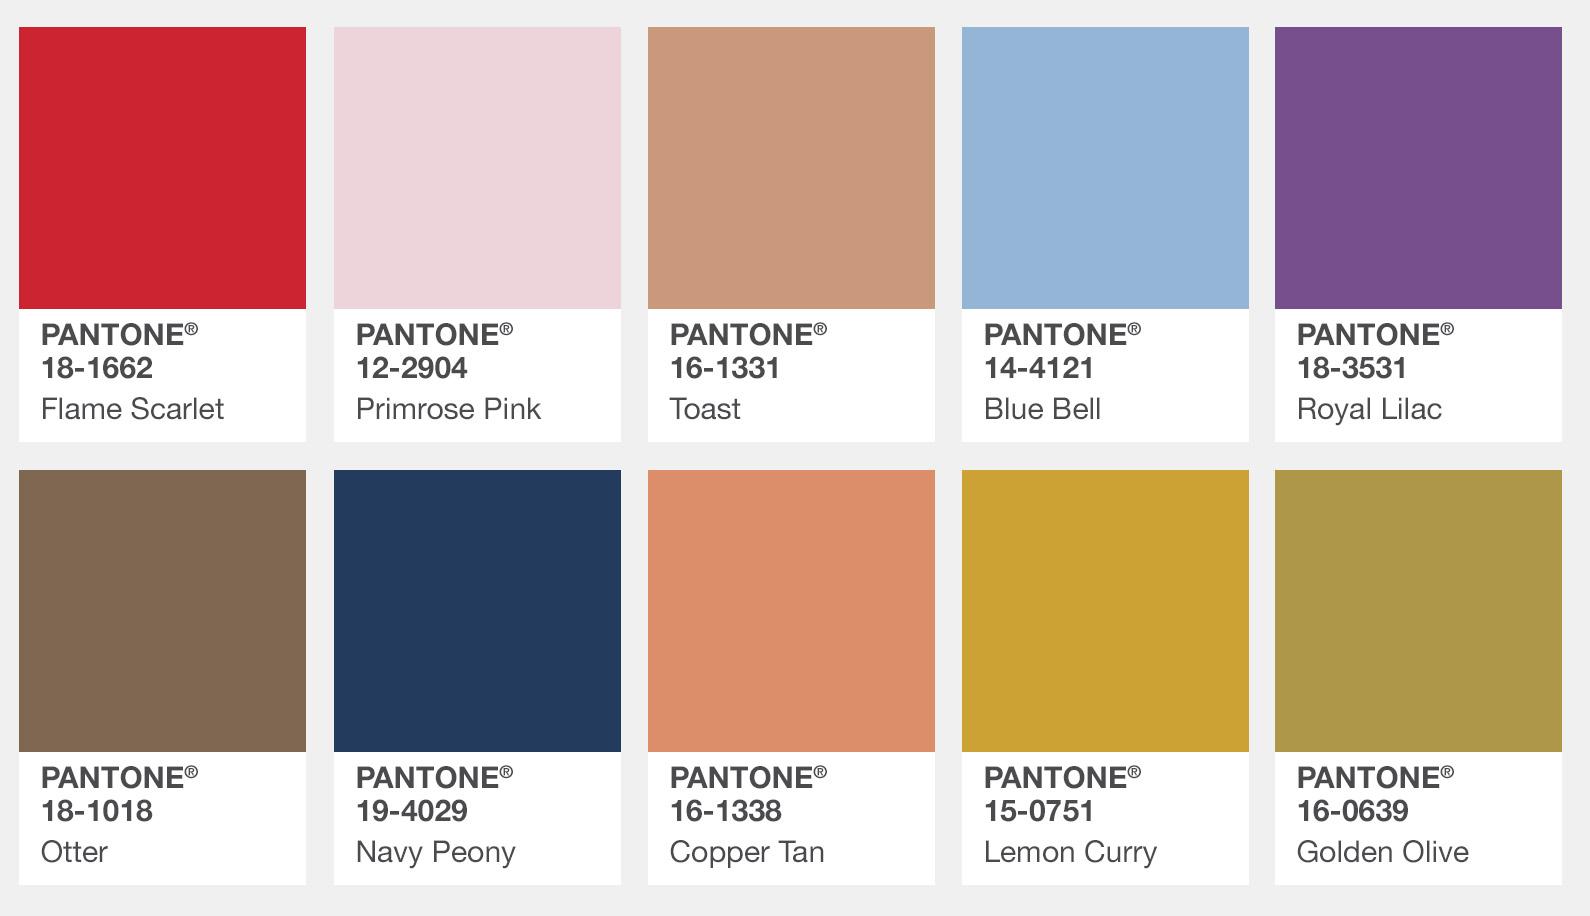 Pantone Autumn 2017 London fashion forecast